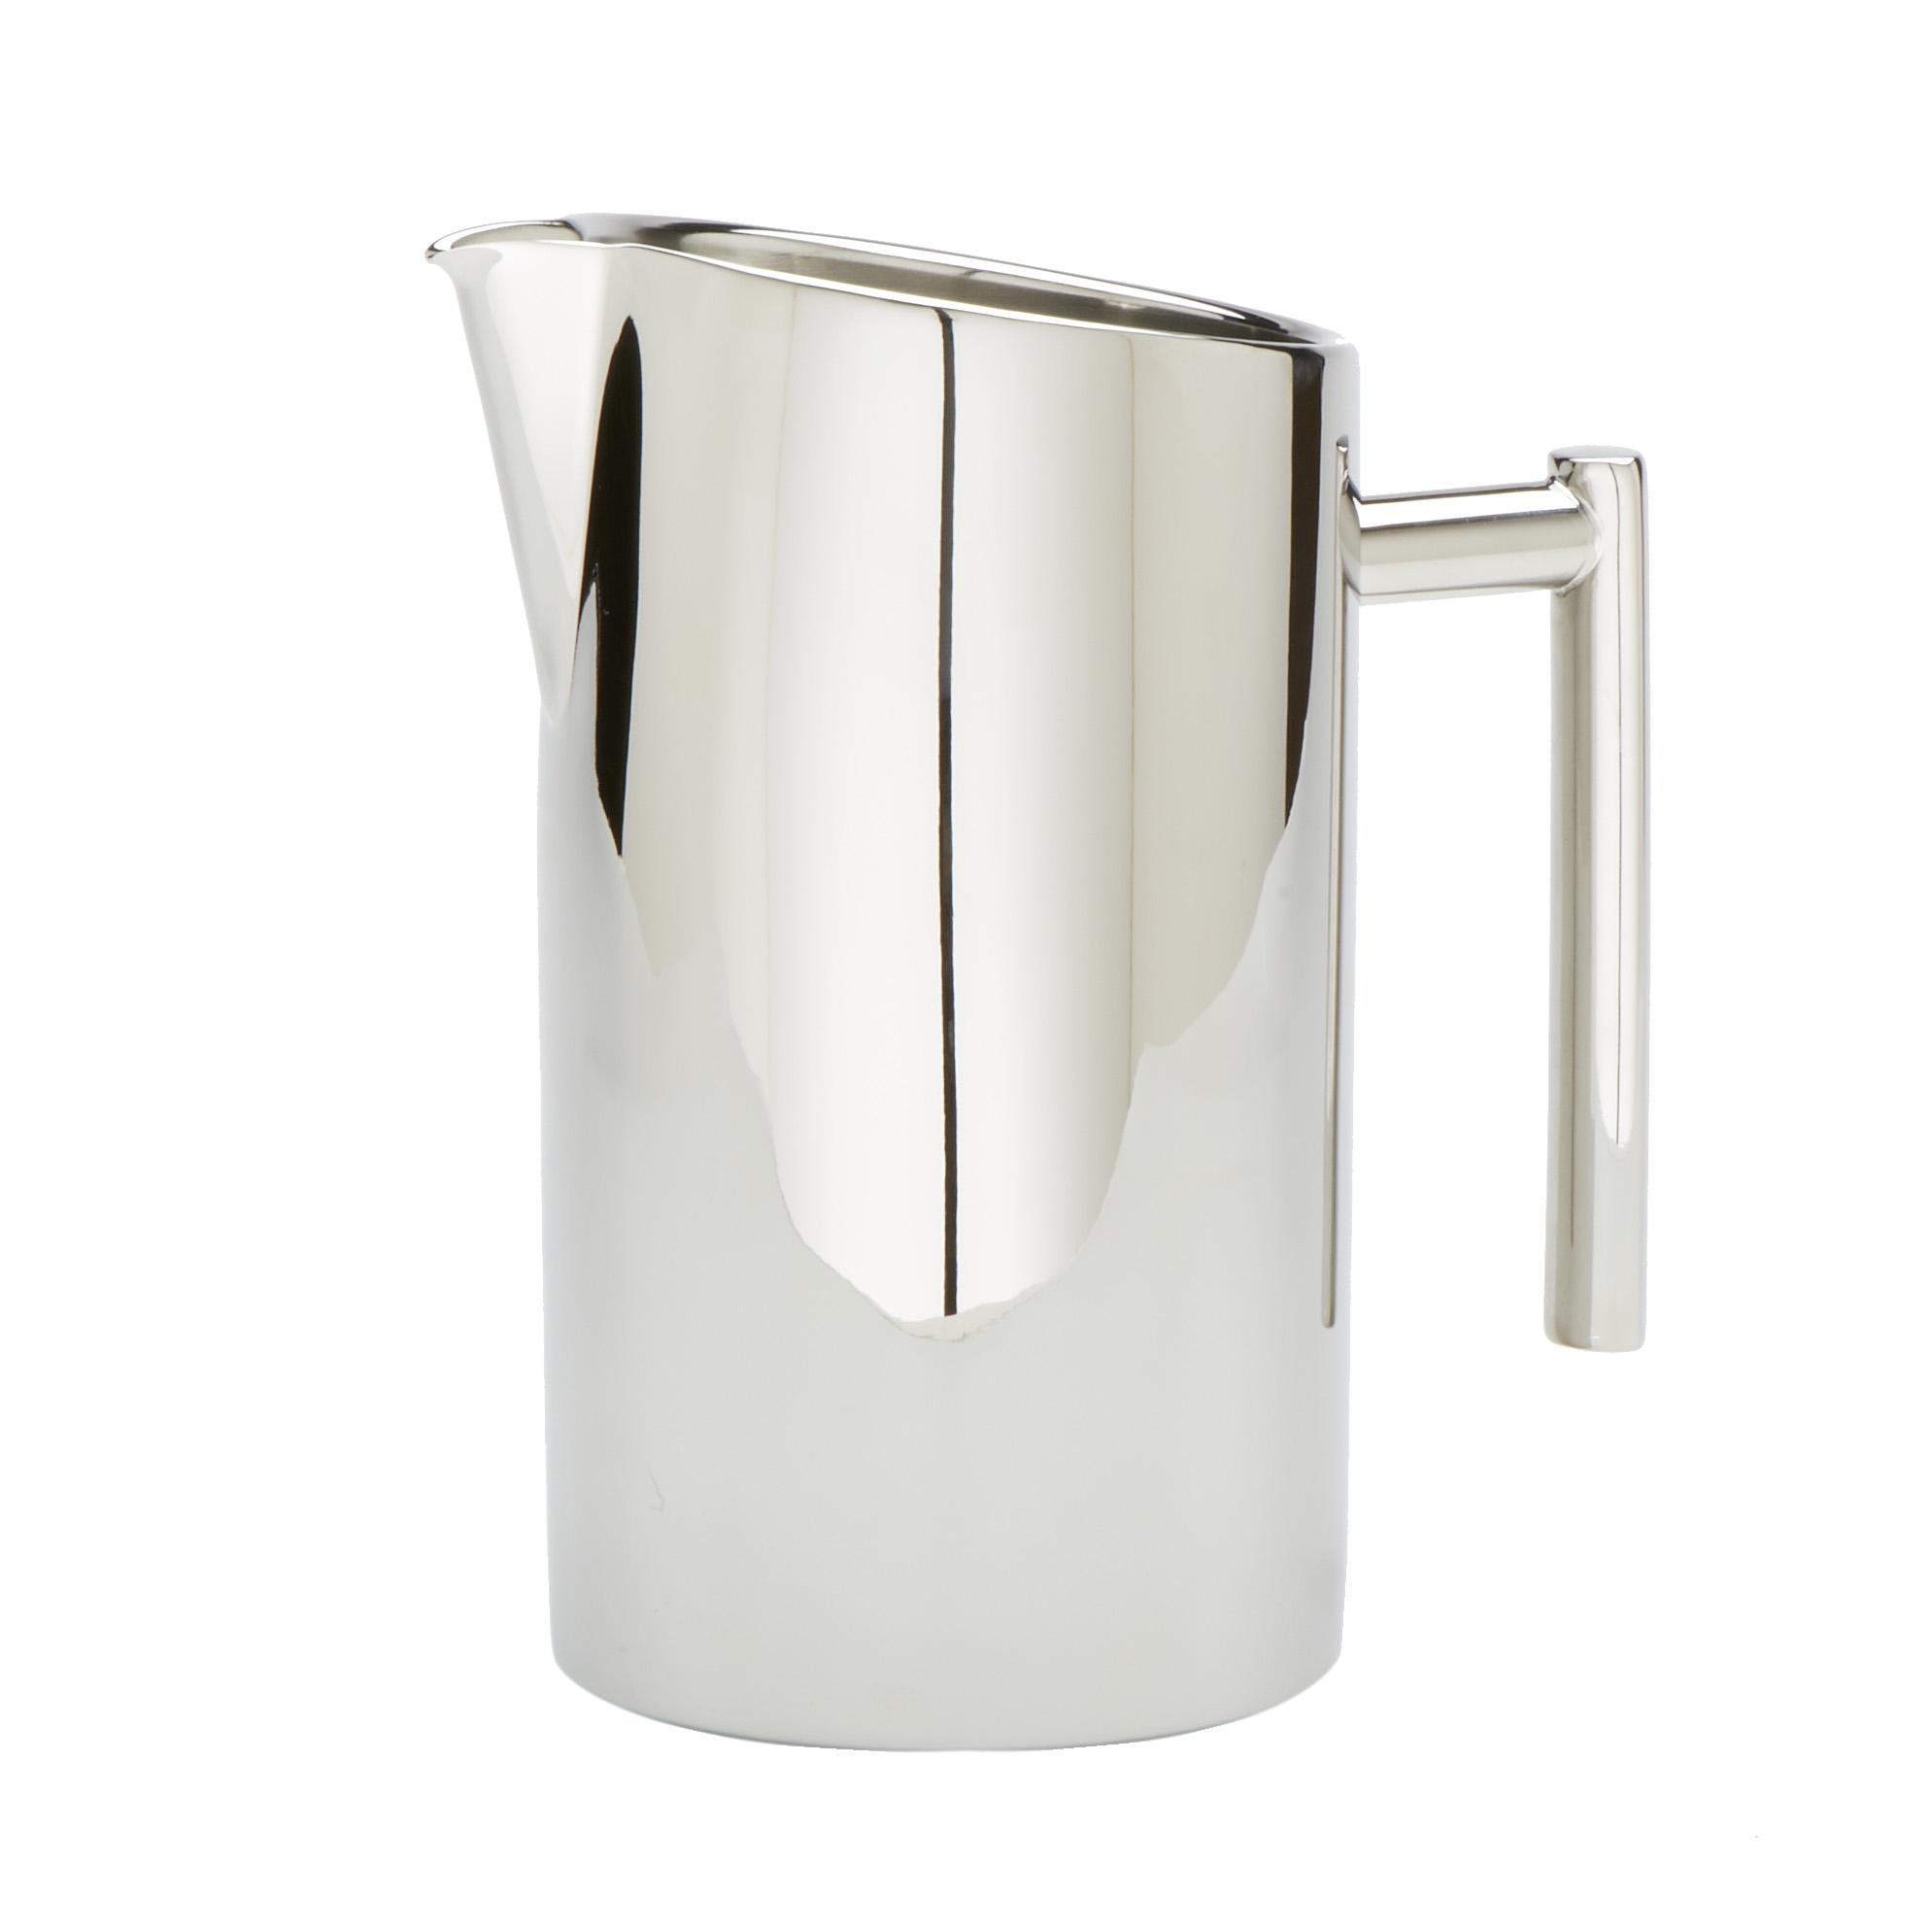 American Metalcraft DWWP50 pitcher, metal